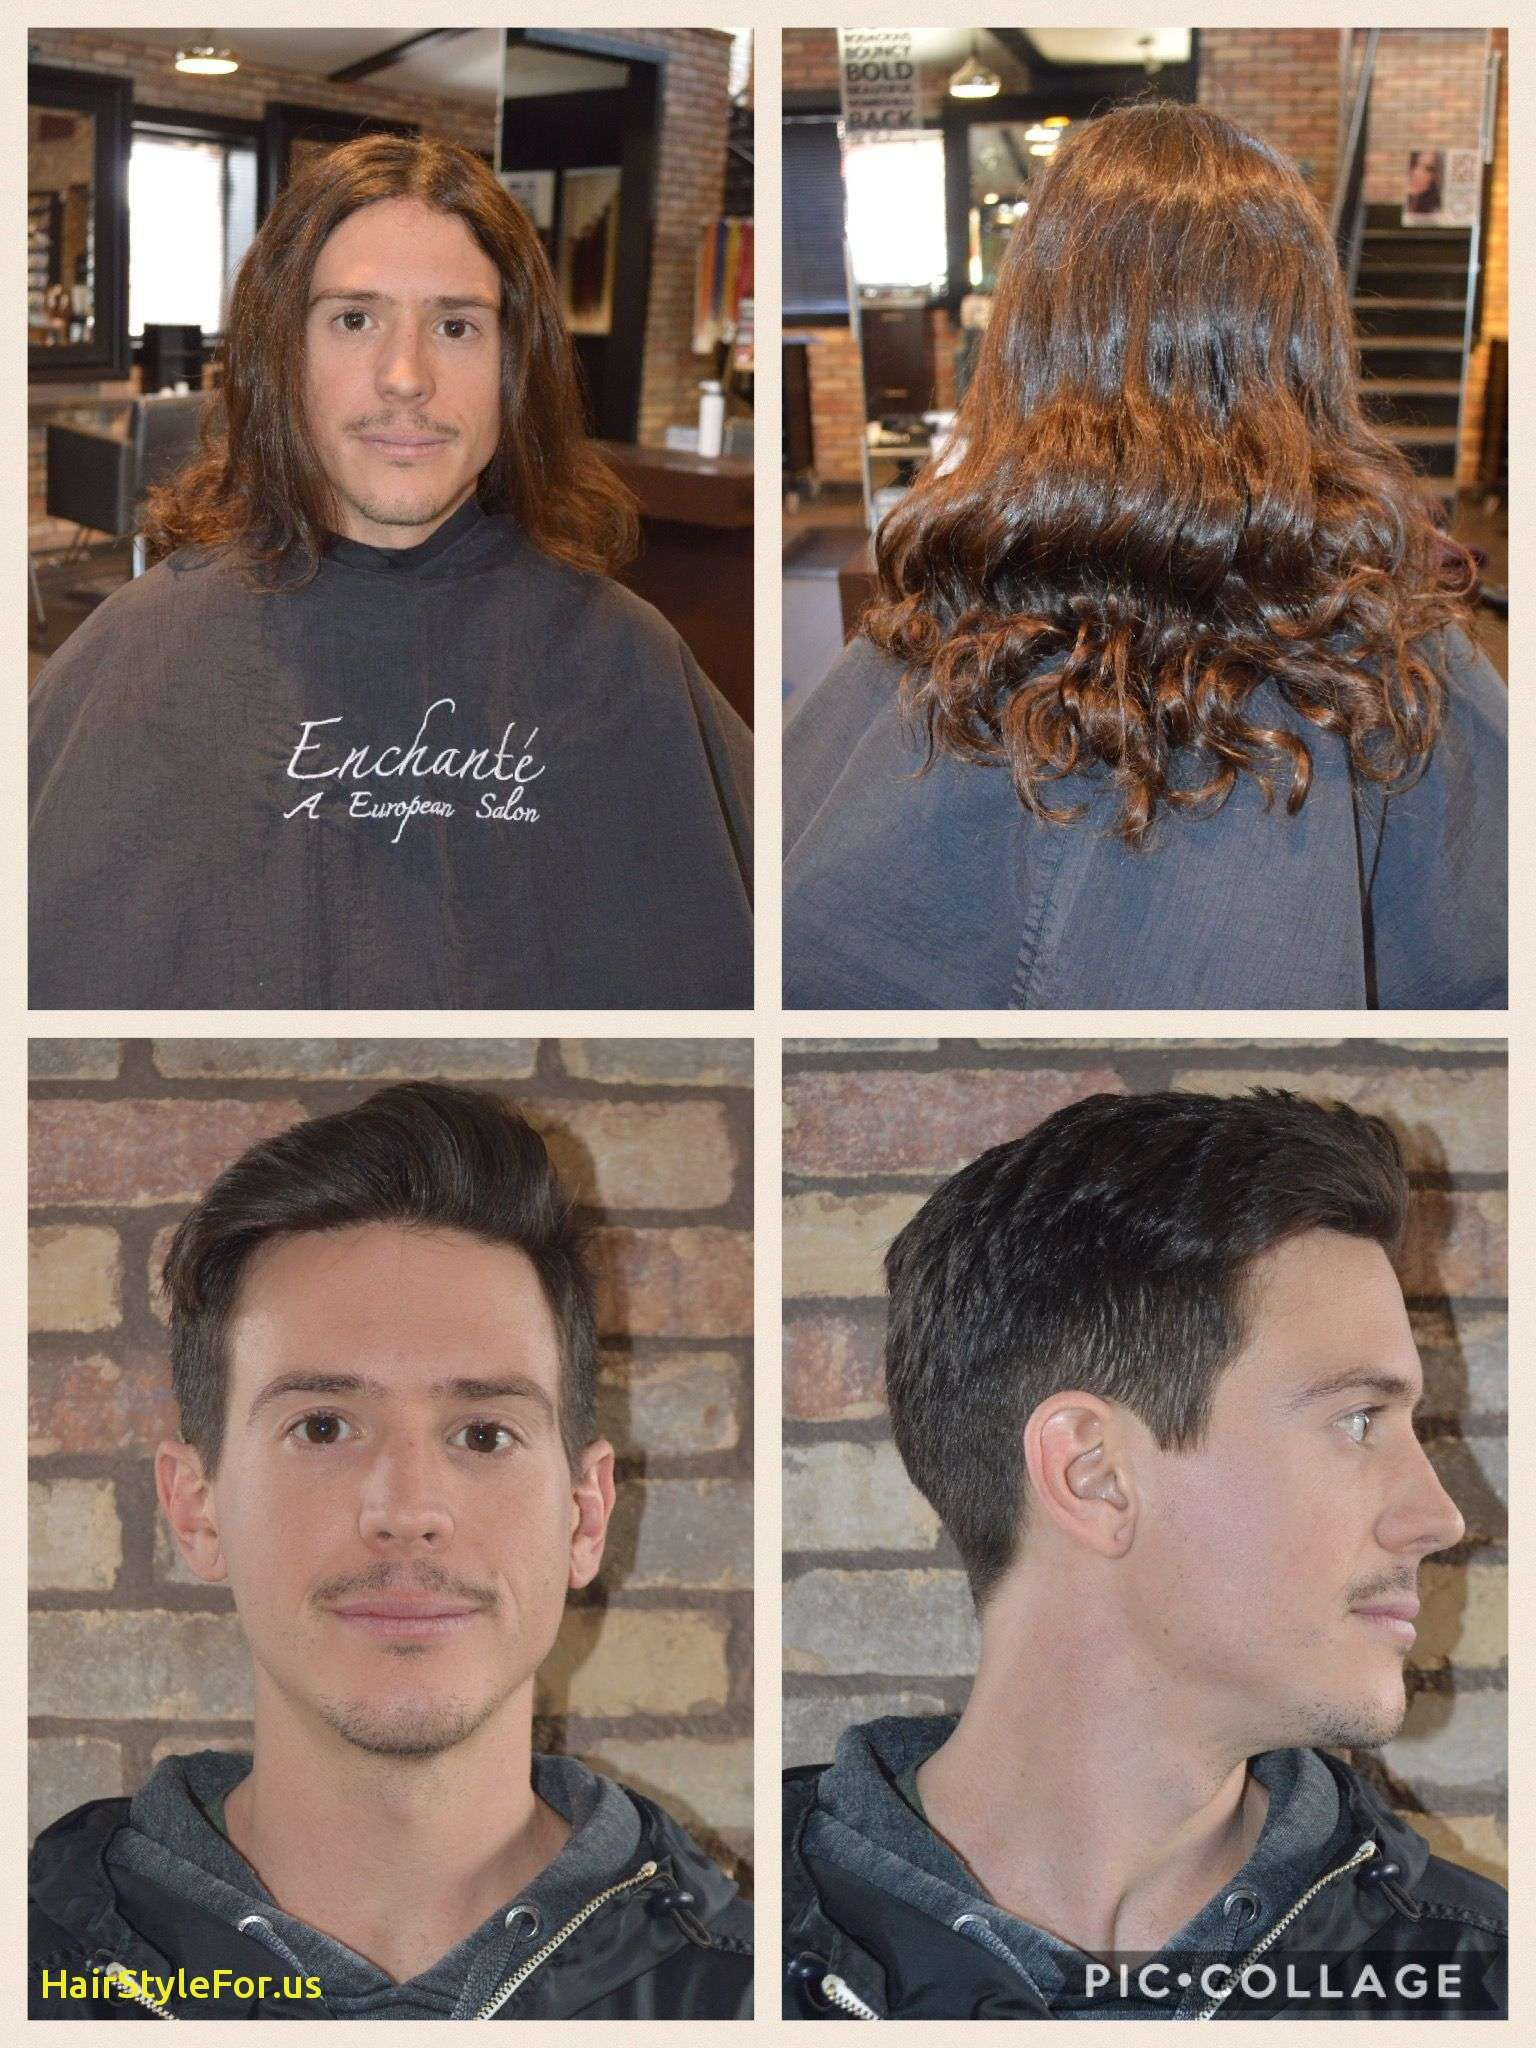 Top 7 Long Hair To Short Hair Transformations Guys Christina Fox Top 7 Long Hair To Short Hair Trans Long To Short Hair Hair Transformation Short Hair Styles